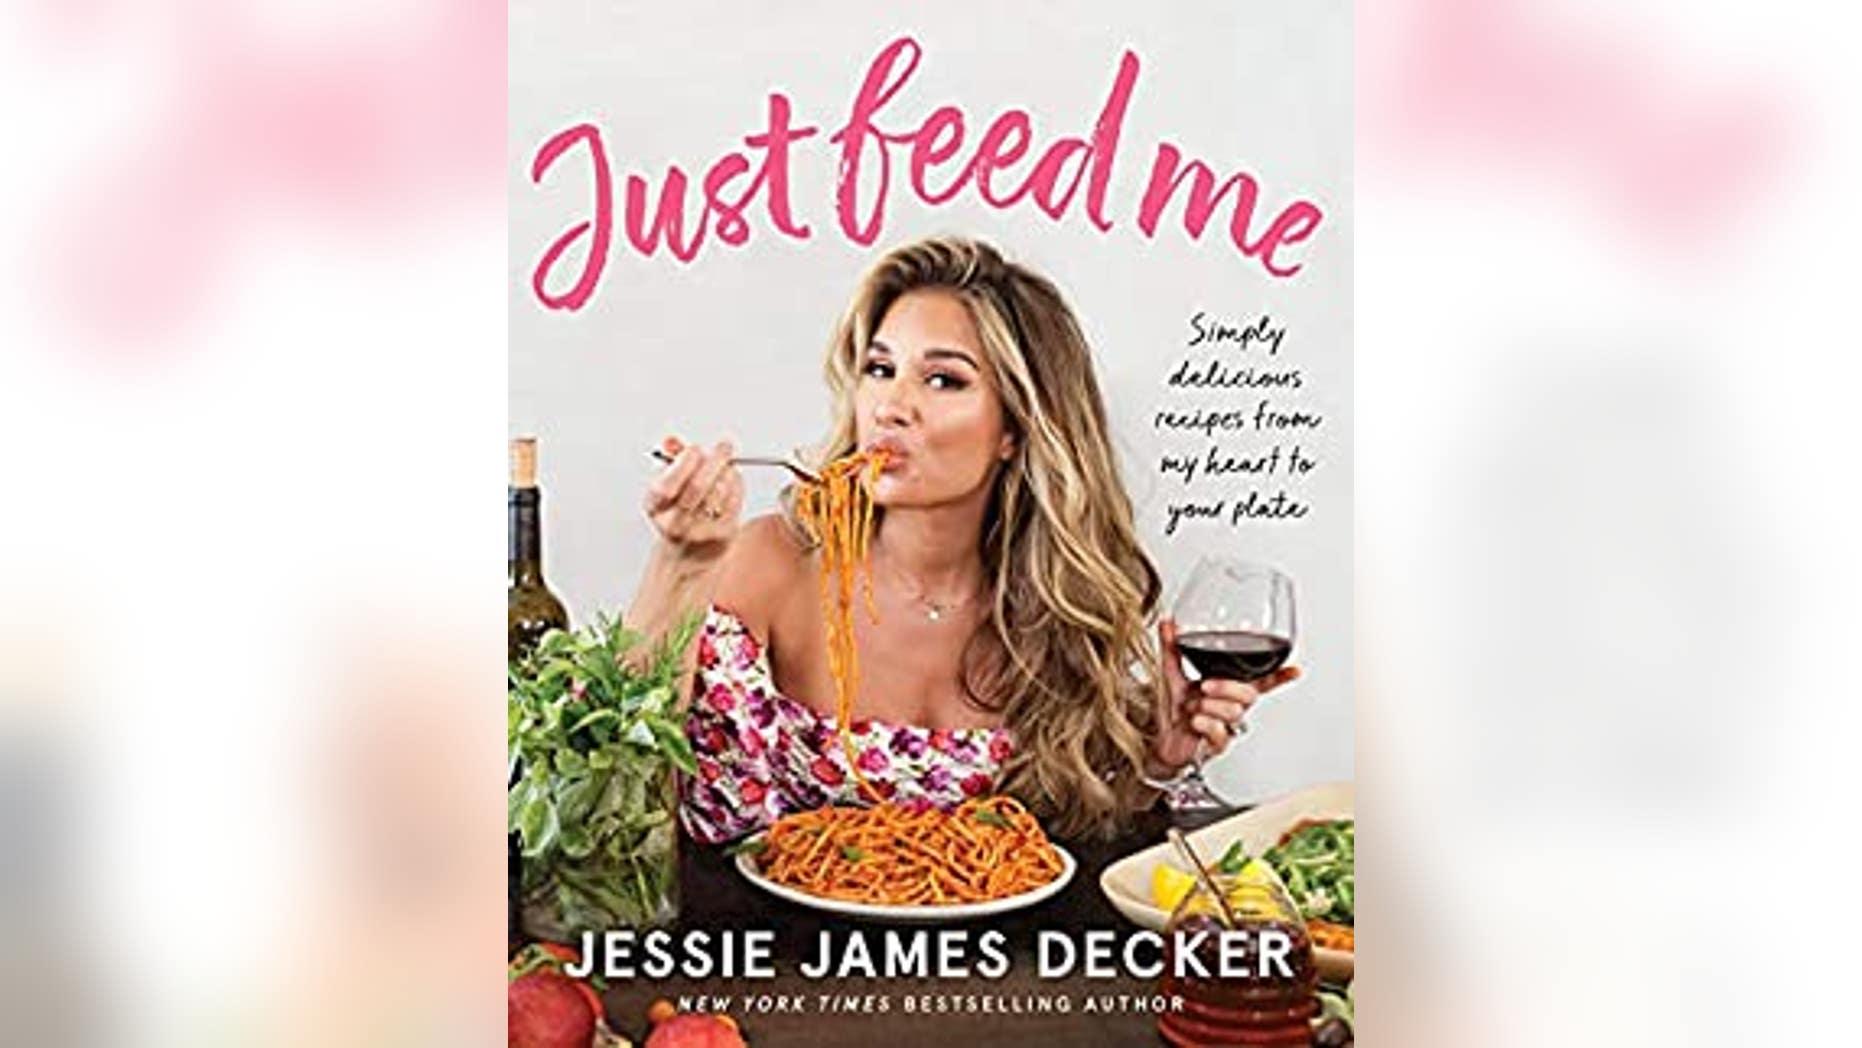 Jessie James Decker's Fried Breakfast Tacos